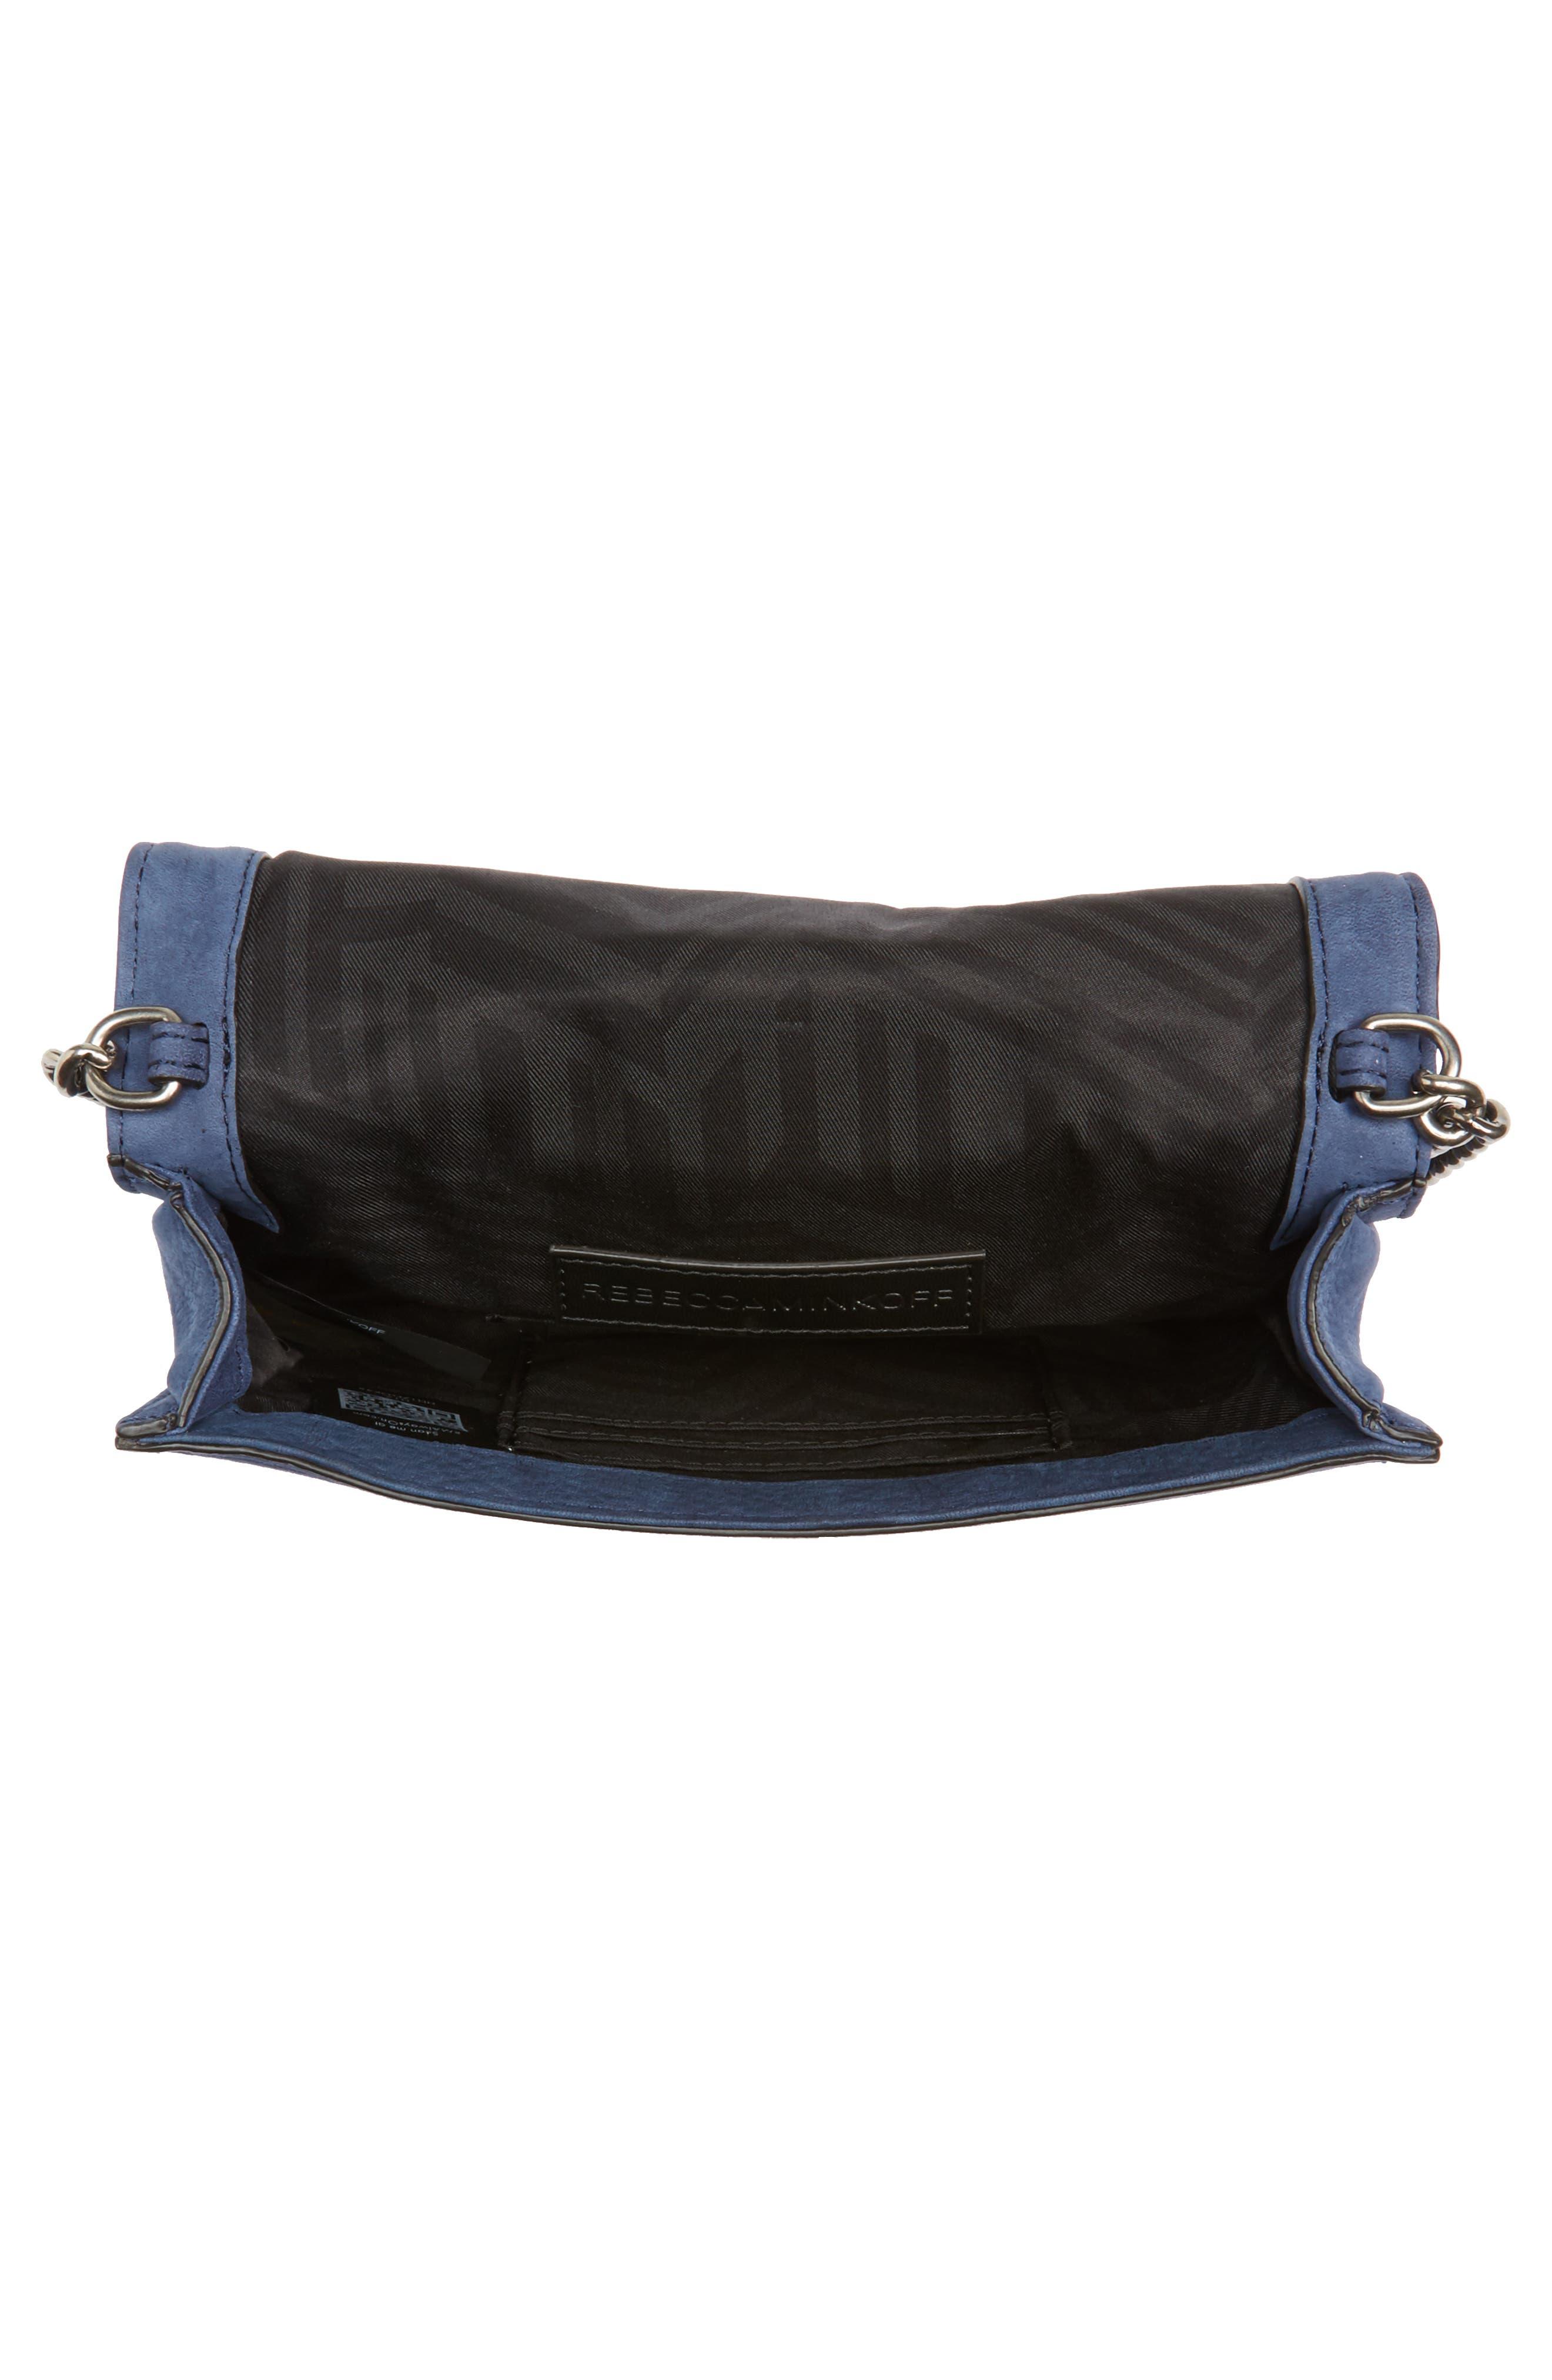 Small Love Nubuck Leather Crossbody Bag,                             Alternate thumbnail 4, color,                             True Navy